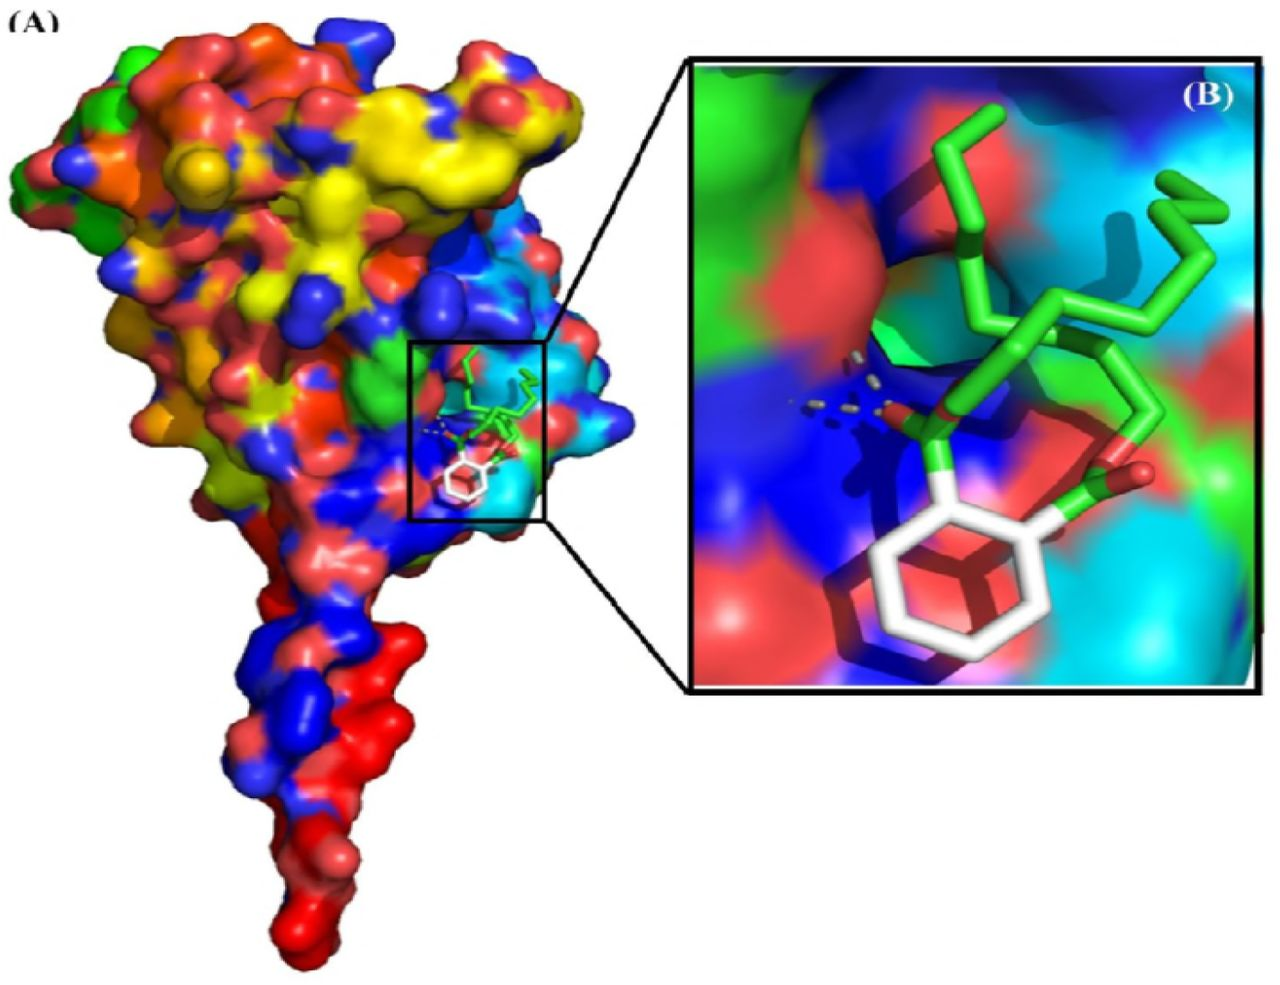 Antiviral viral compound from Streptomyces ghanaensis like strain